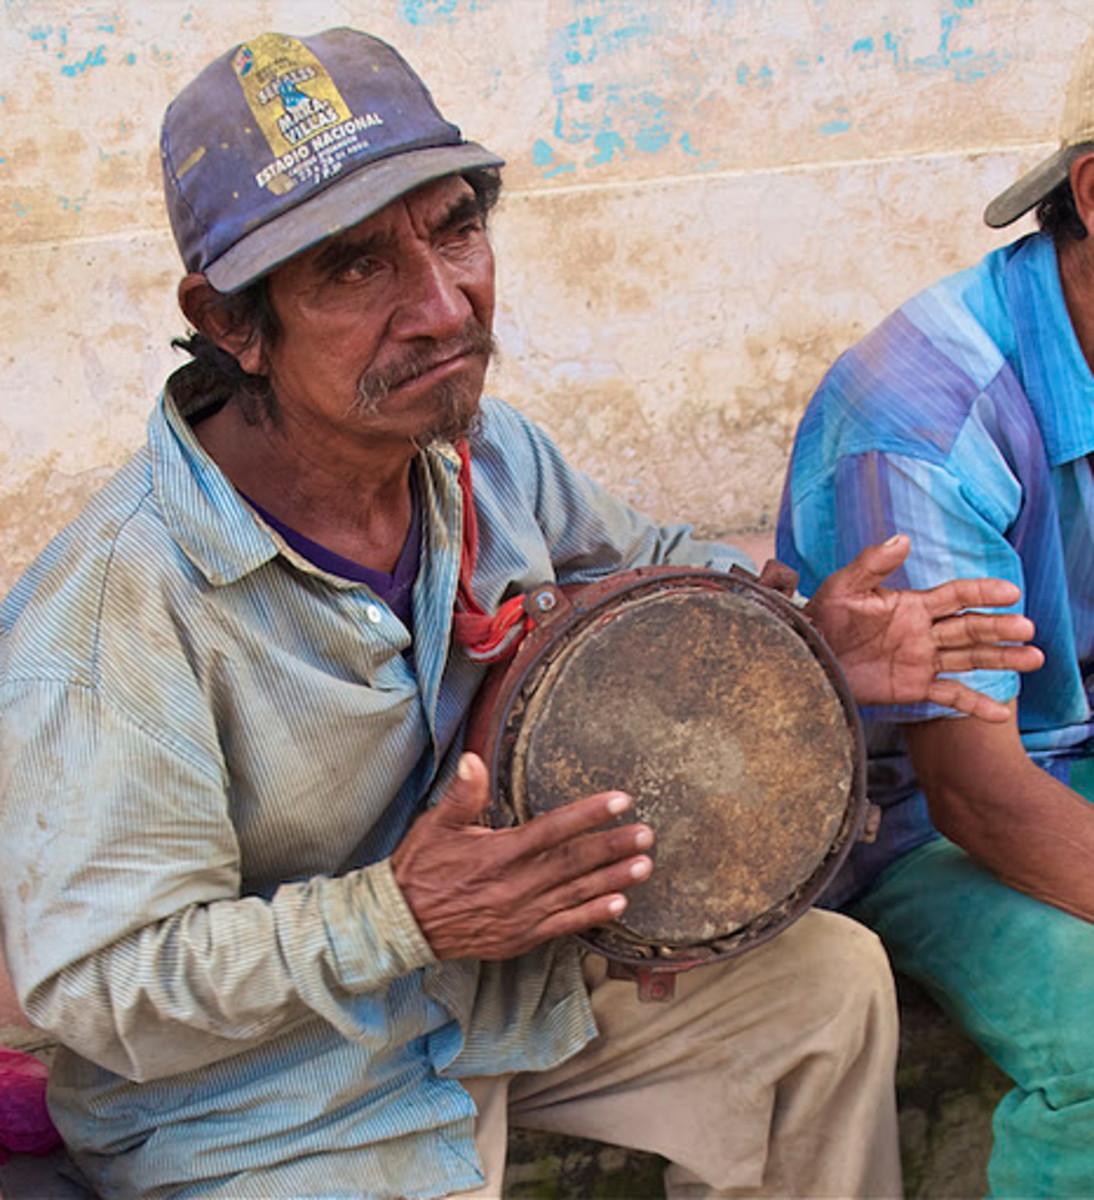 Bongo player in street band Diriamba, Nicaragua